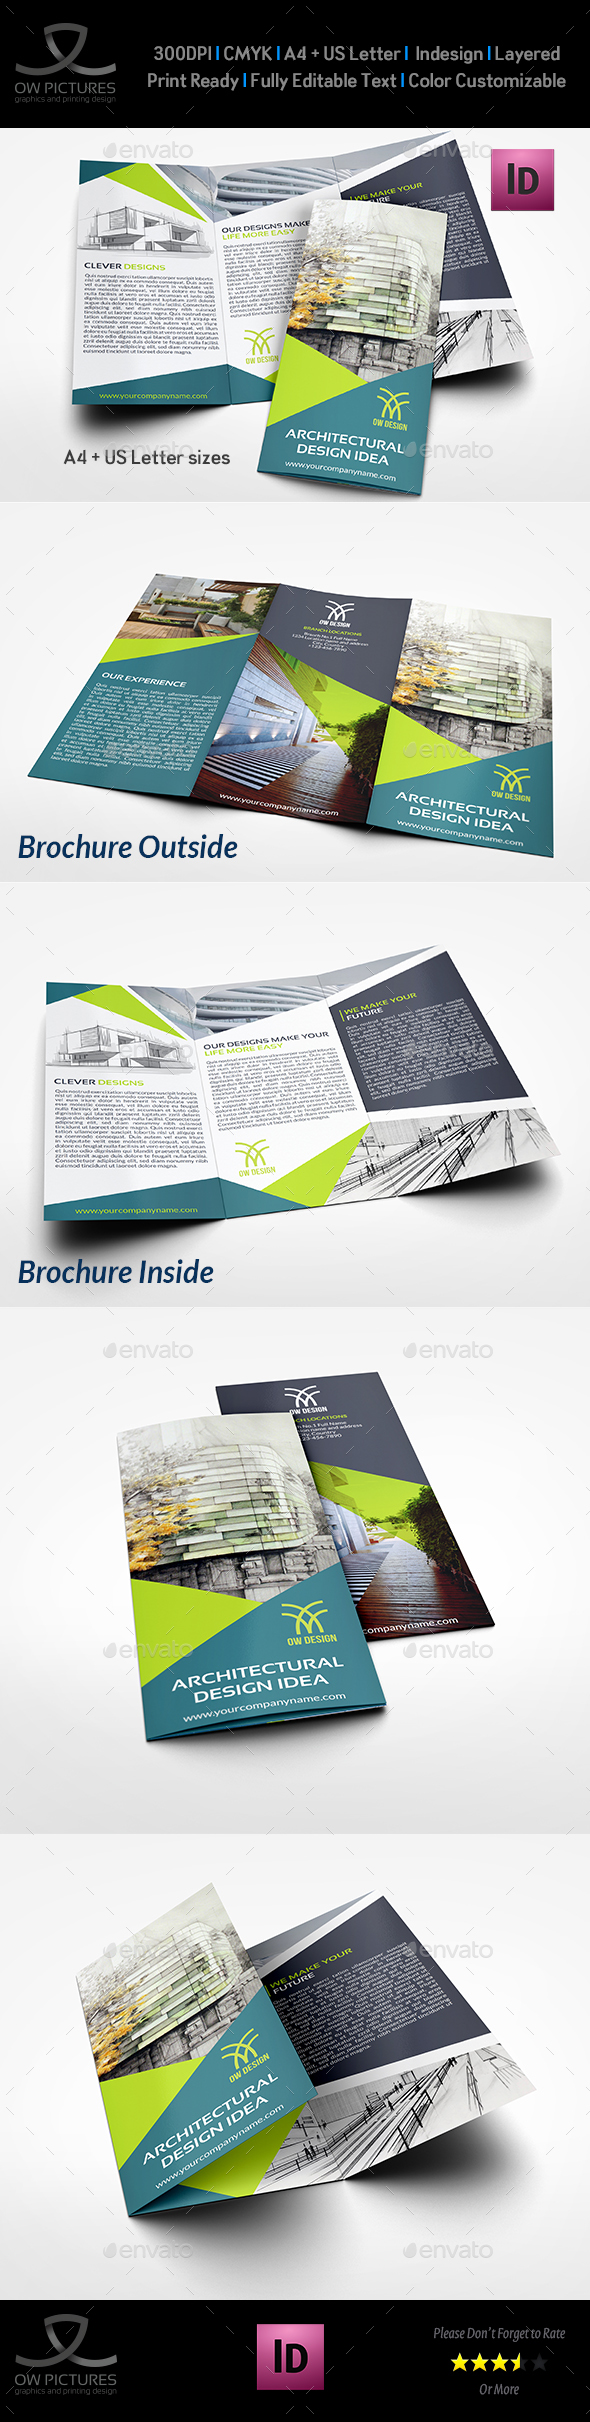 Architectural Design Tri-Fold Brochure Template - Brochures Print Templates